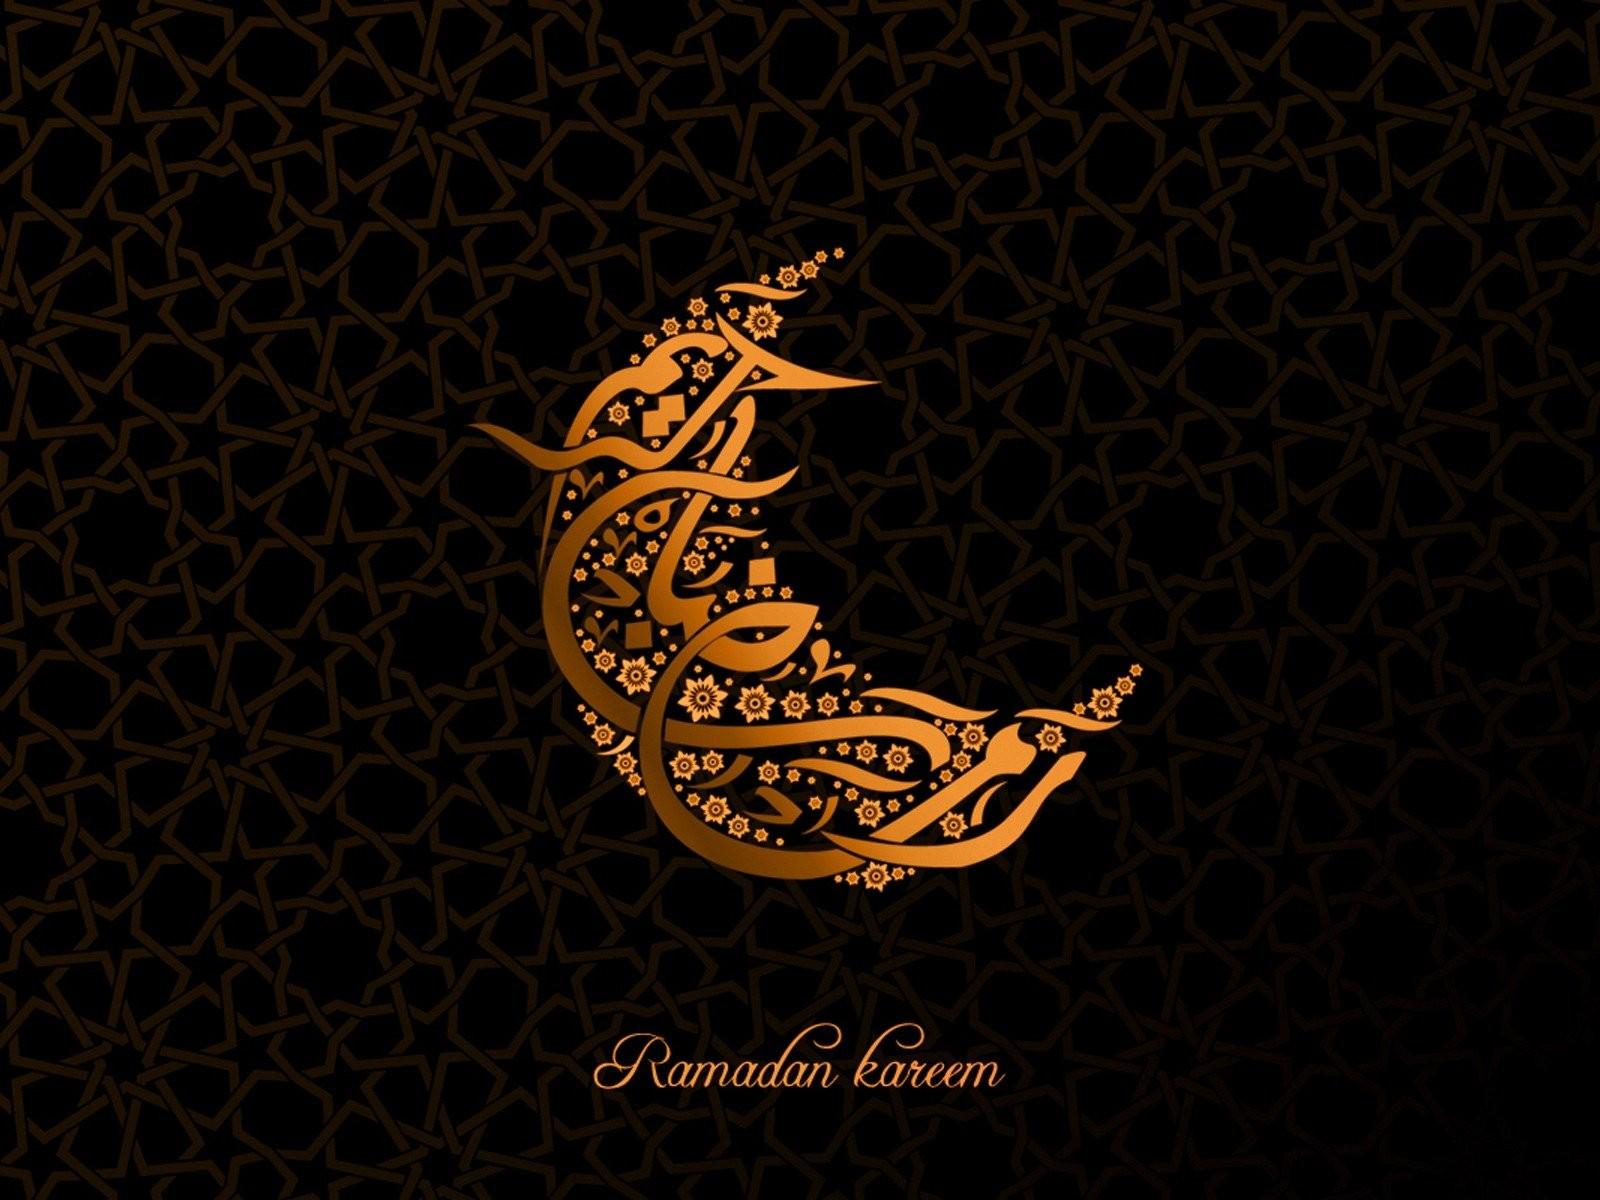 Gambar Animasi Bergerak Bulan Ramadhan 1434H 2013Krakatau Nimbun